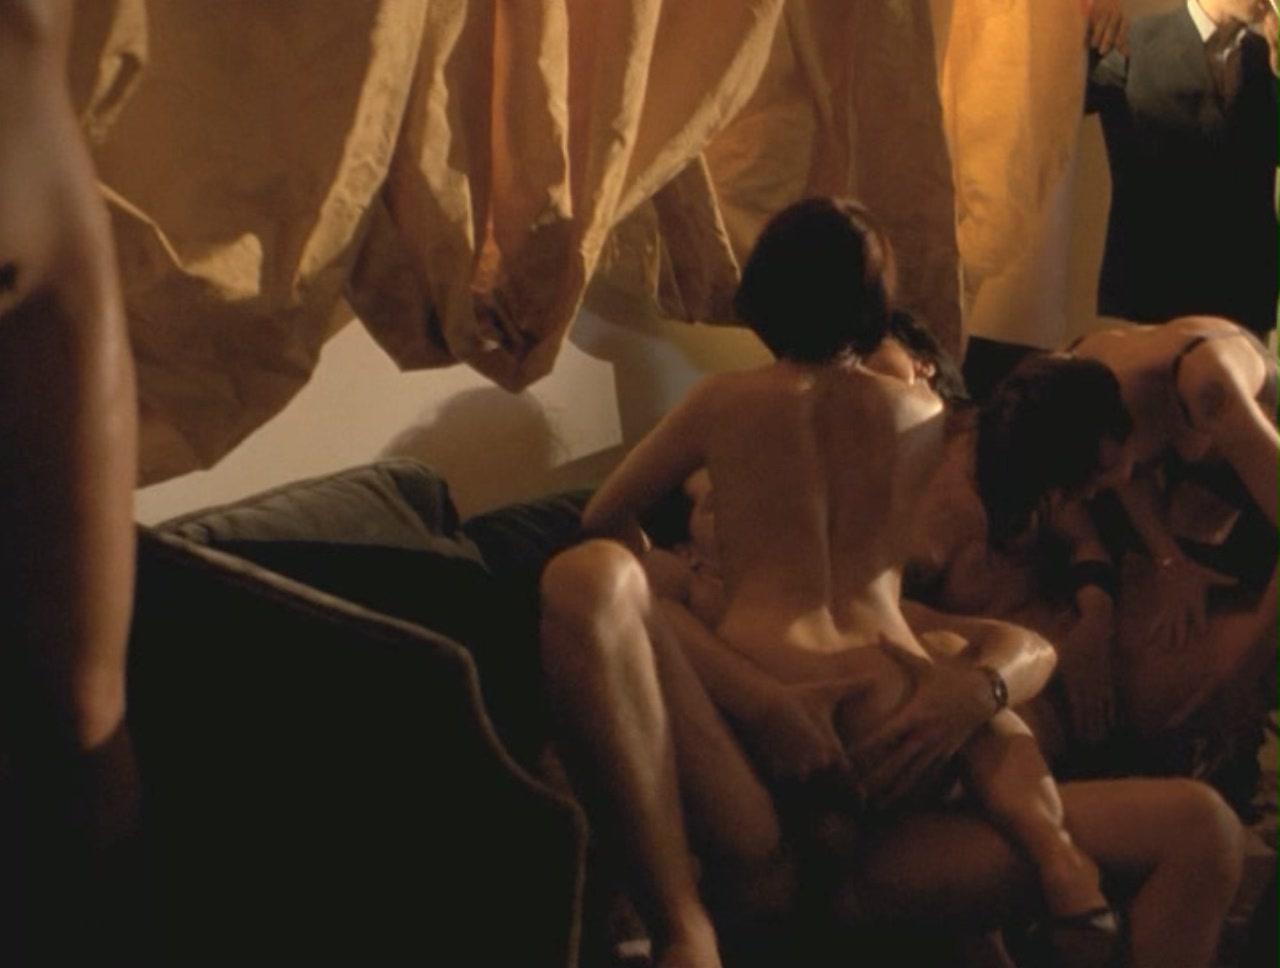 erotika-kitayanochka